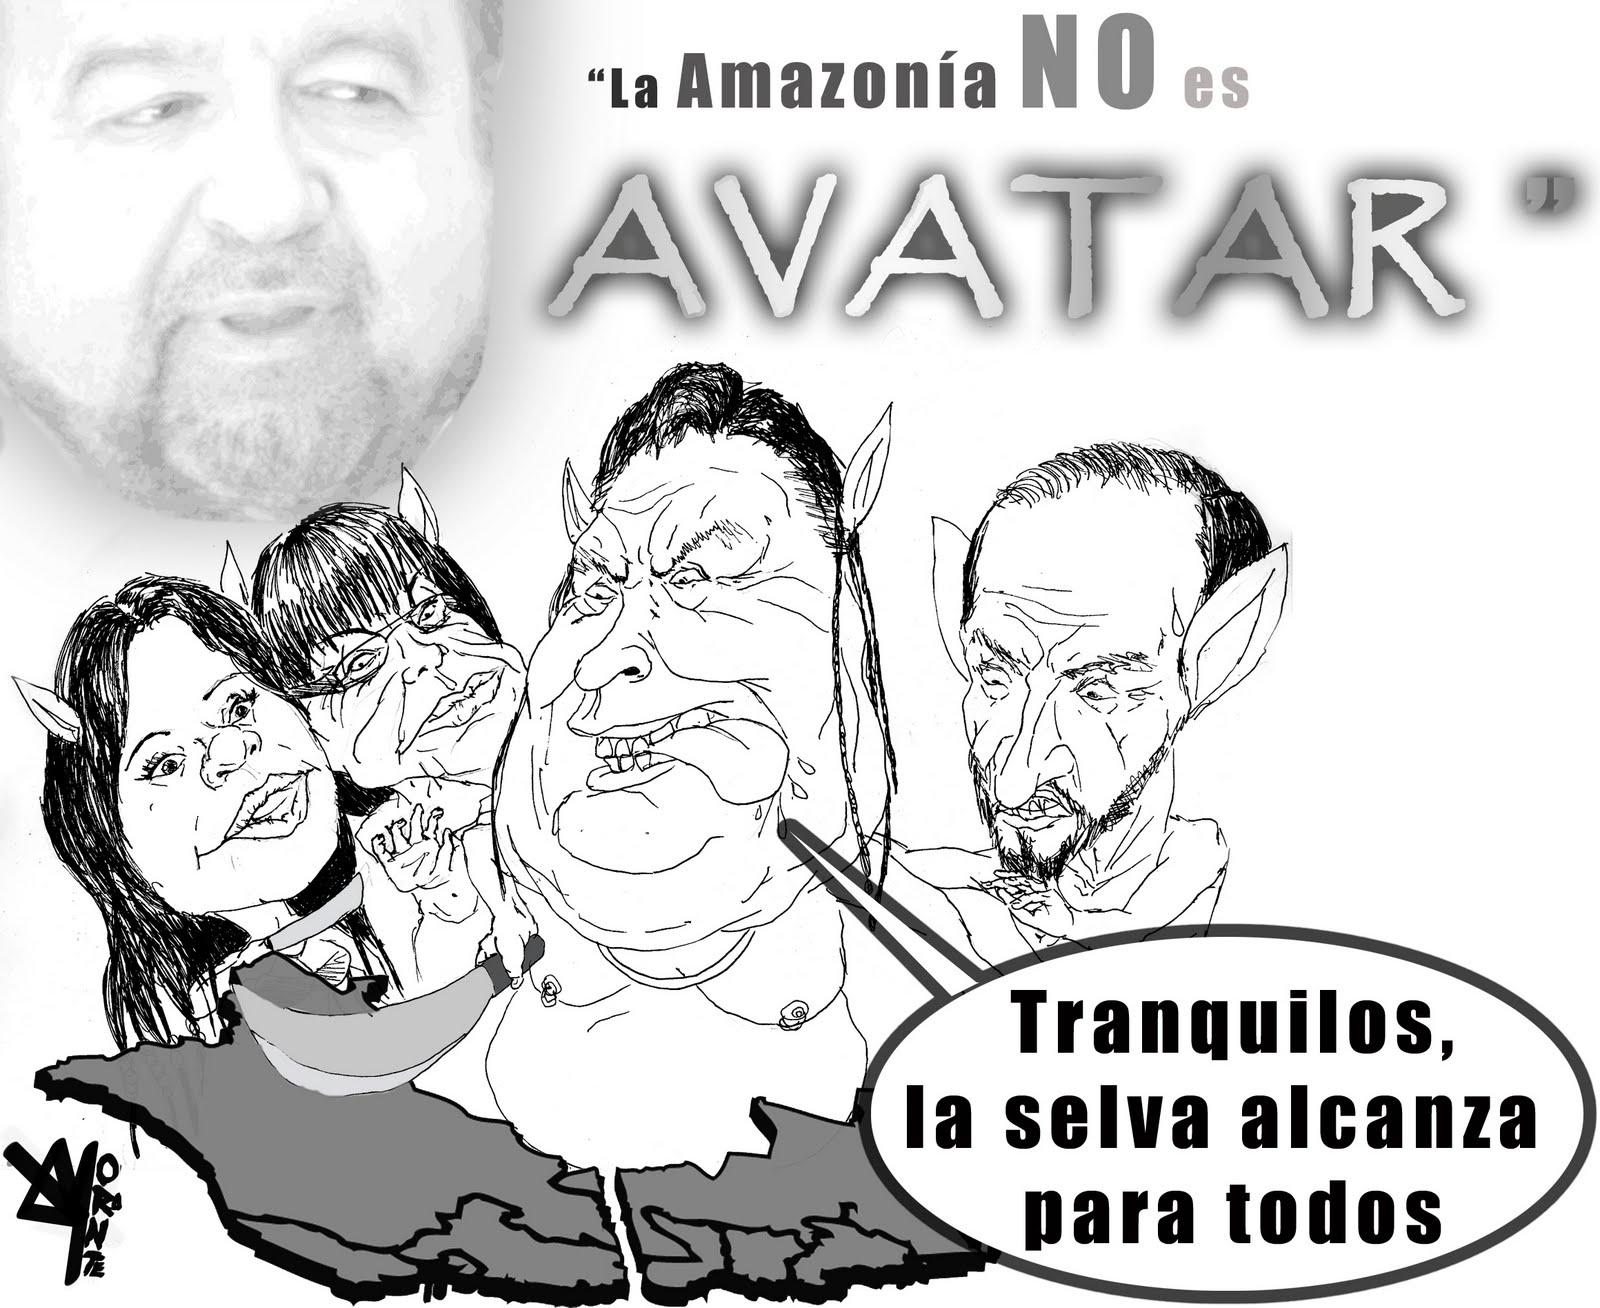 http://4.bp.blogspot.com/_WF-TE9iZJpU/TCQcEnAXV_I/AAAAAAAAACU/Bvo37Q_pEXE/s1600/La+amazonia+no+es+avatar.jpg